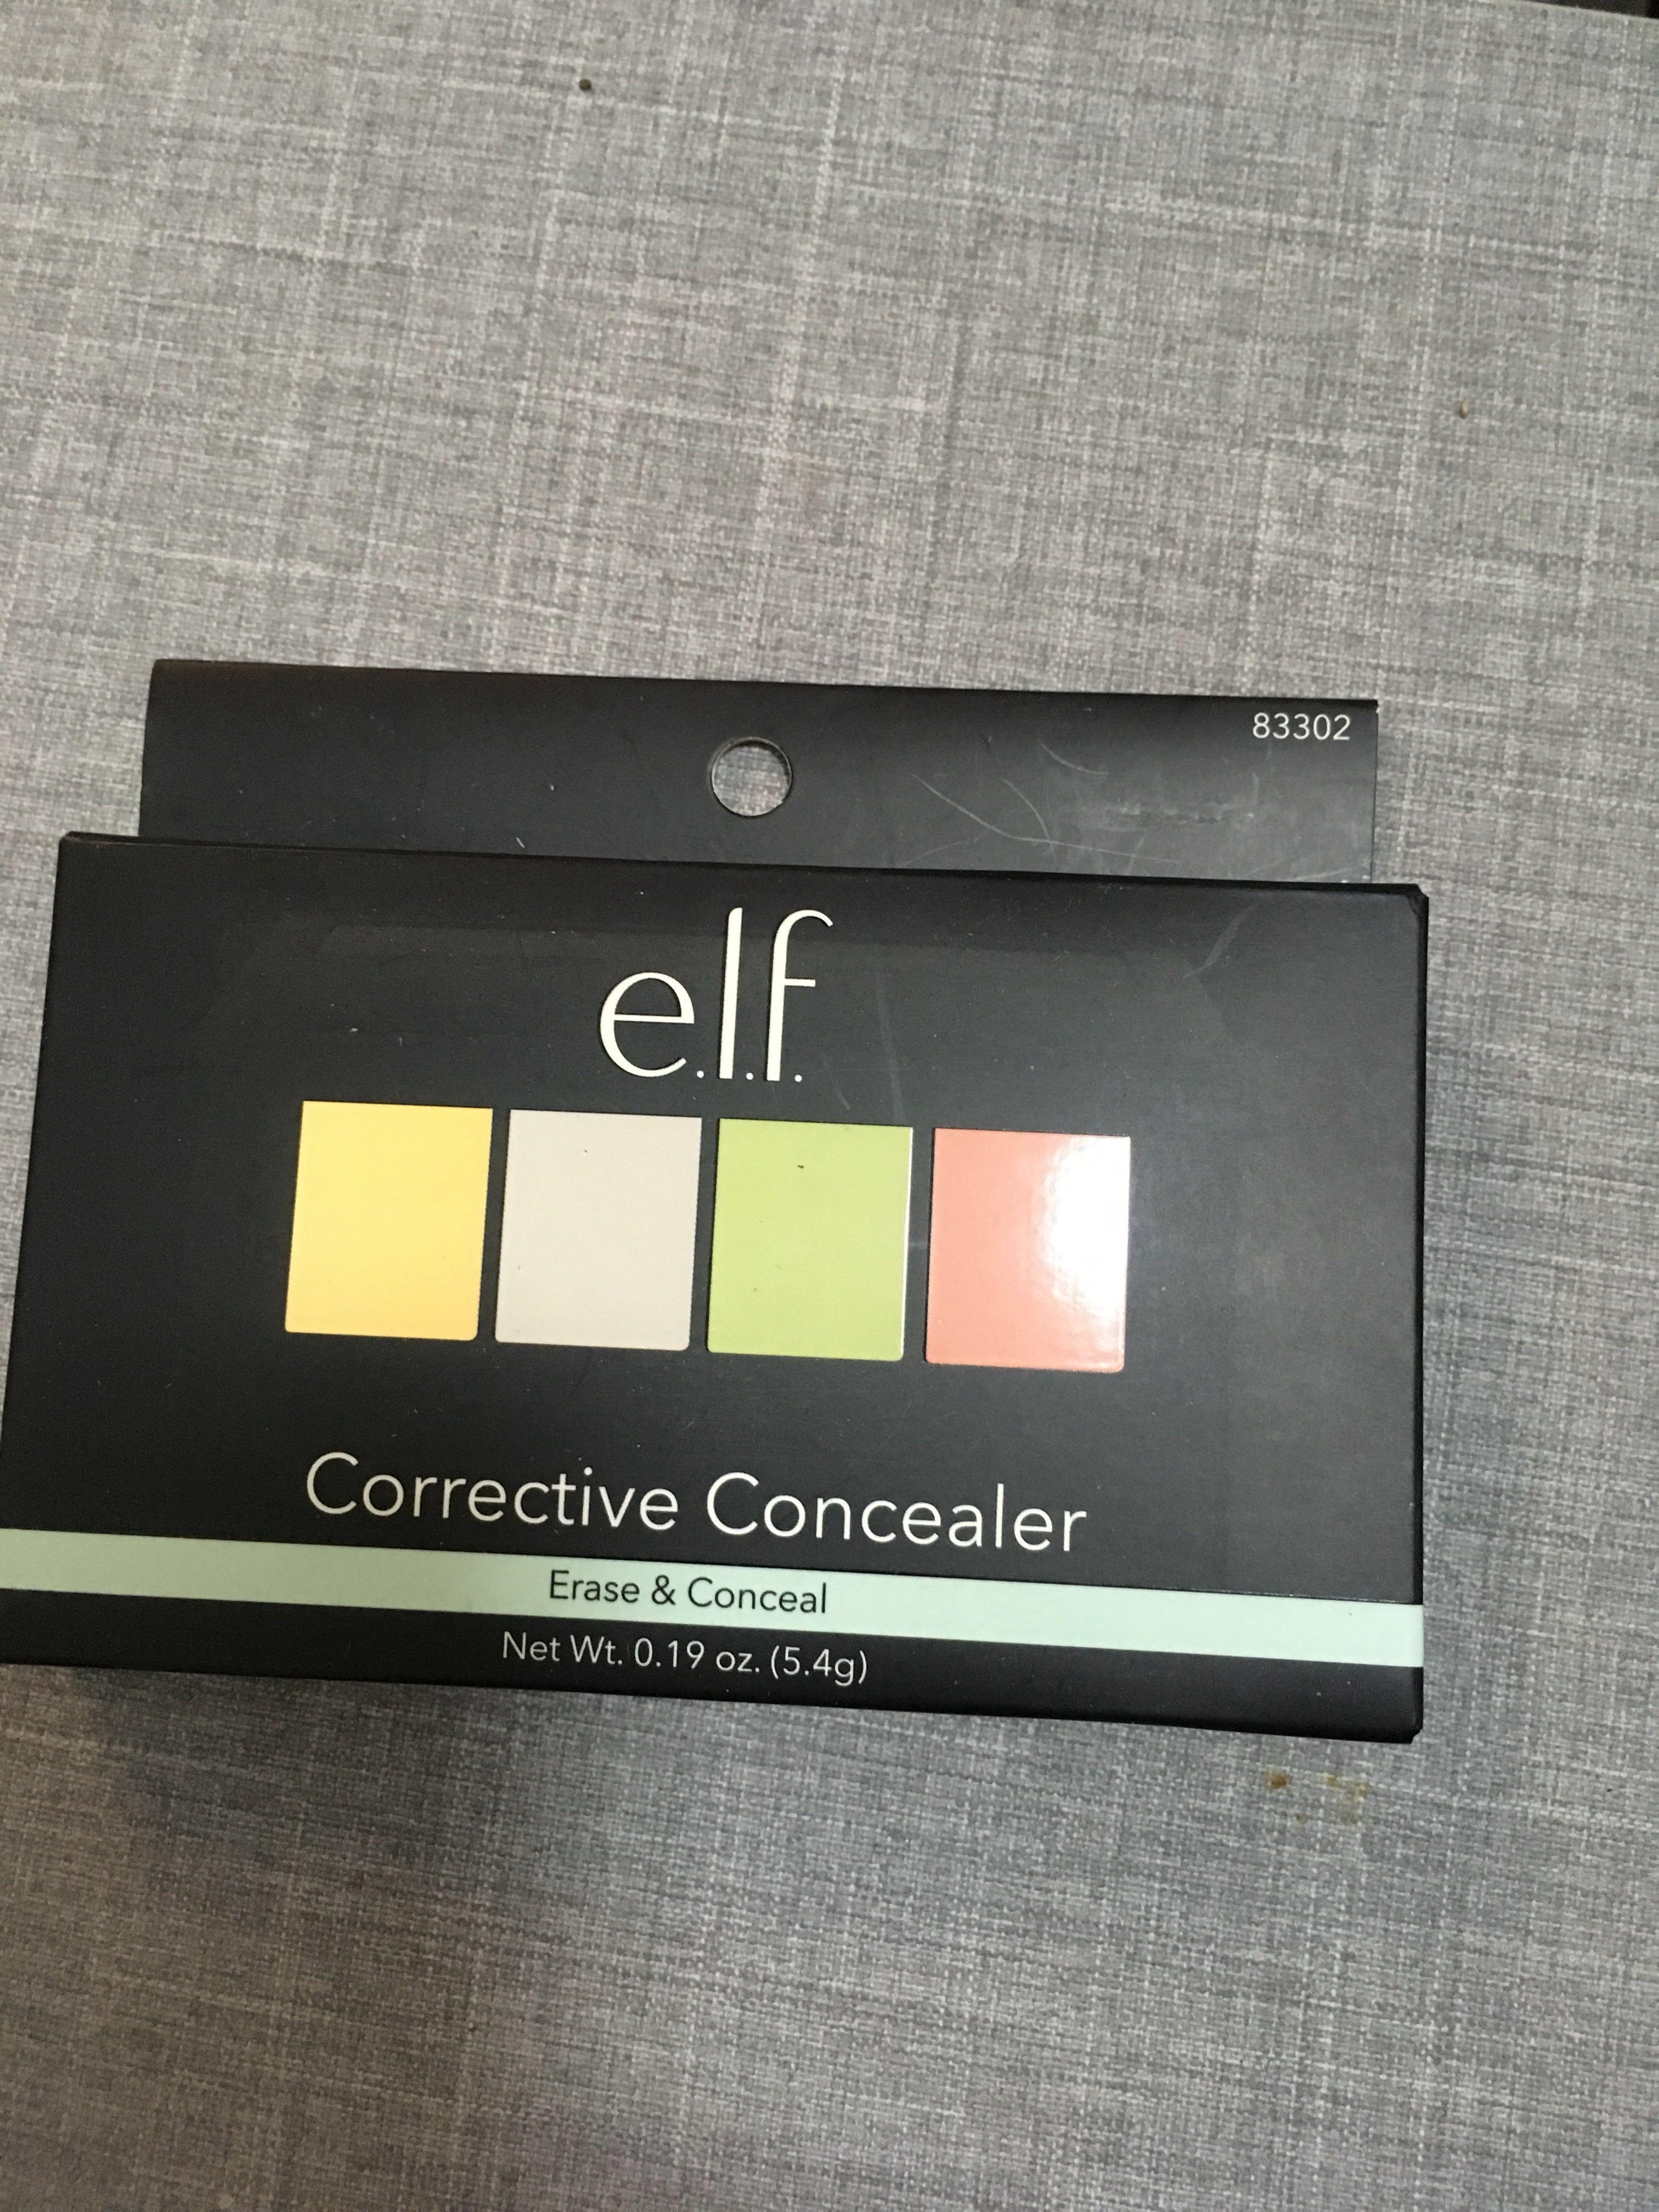 e.l.f. Corrective Concealer Palette 校色遮瑕盤